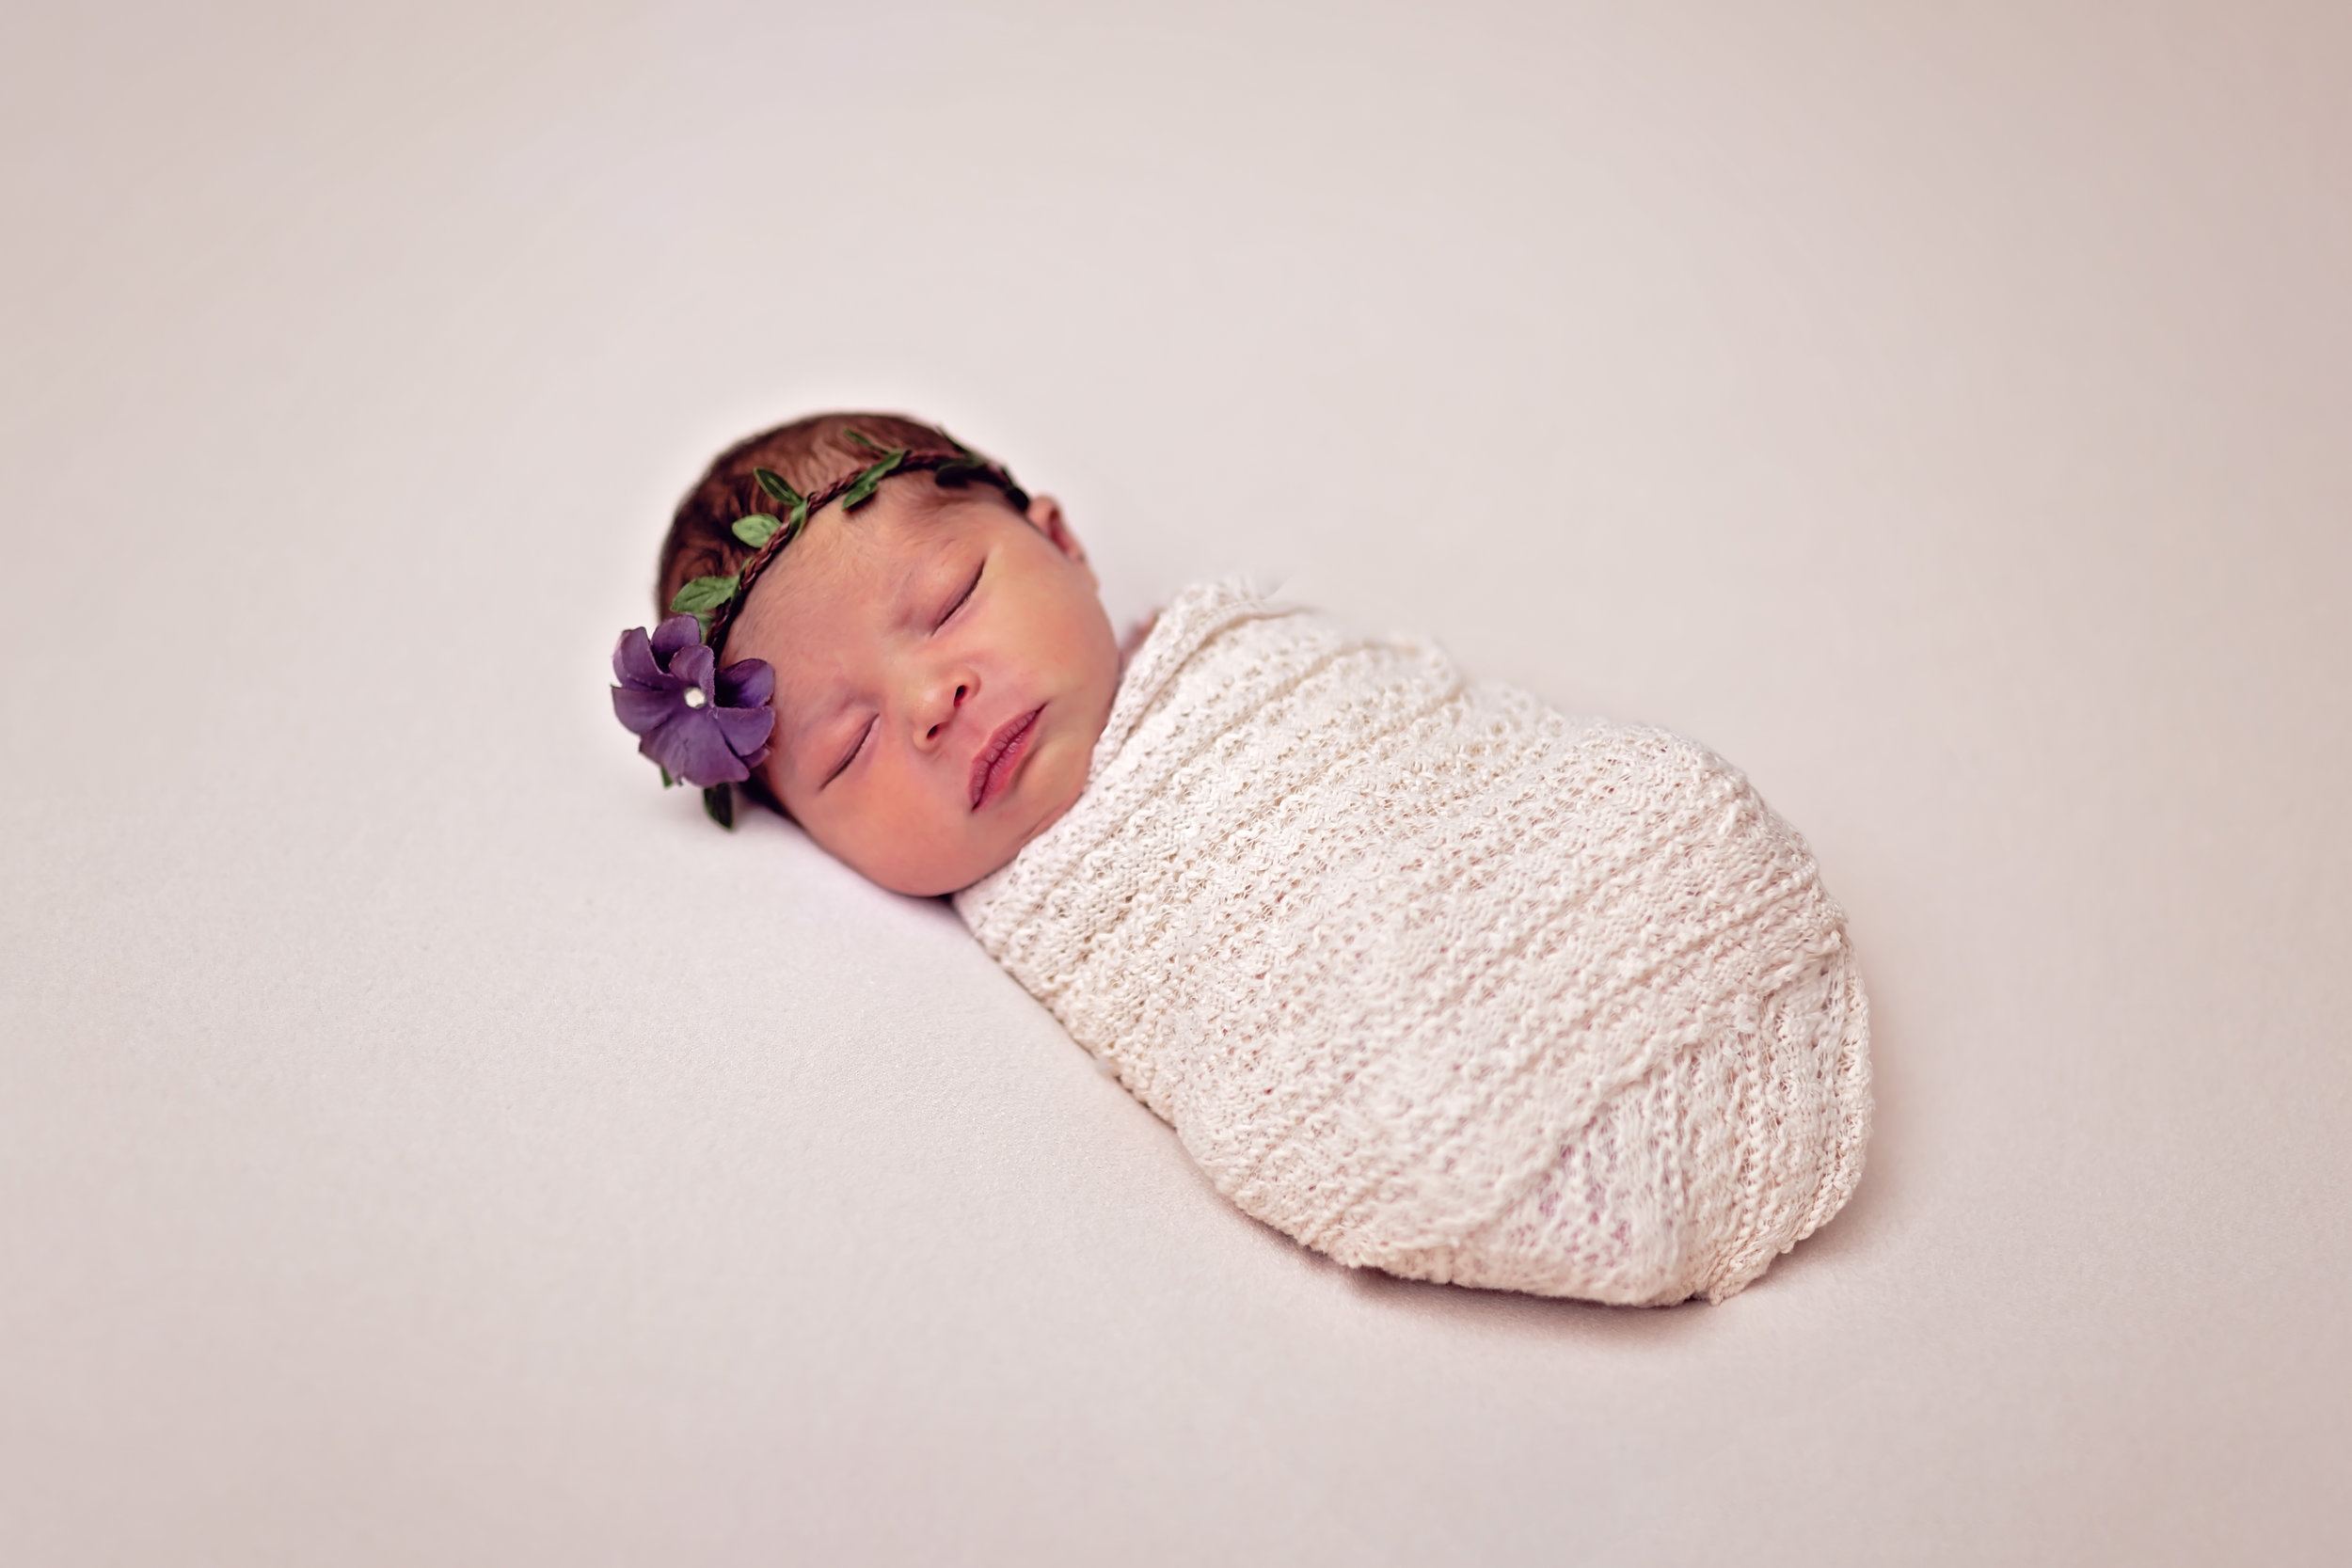 studio posed newborn photographer fort leonard wood mo